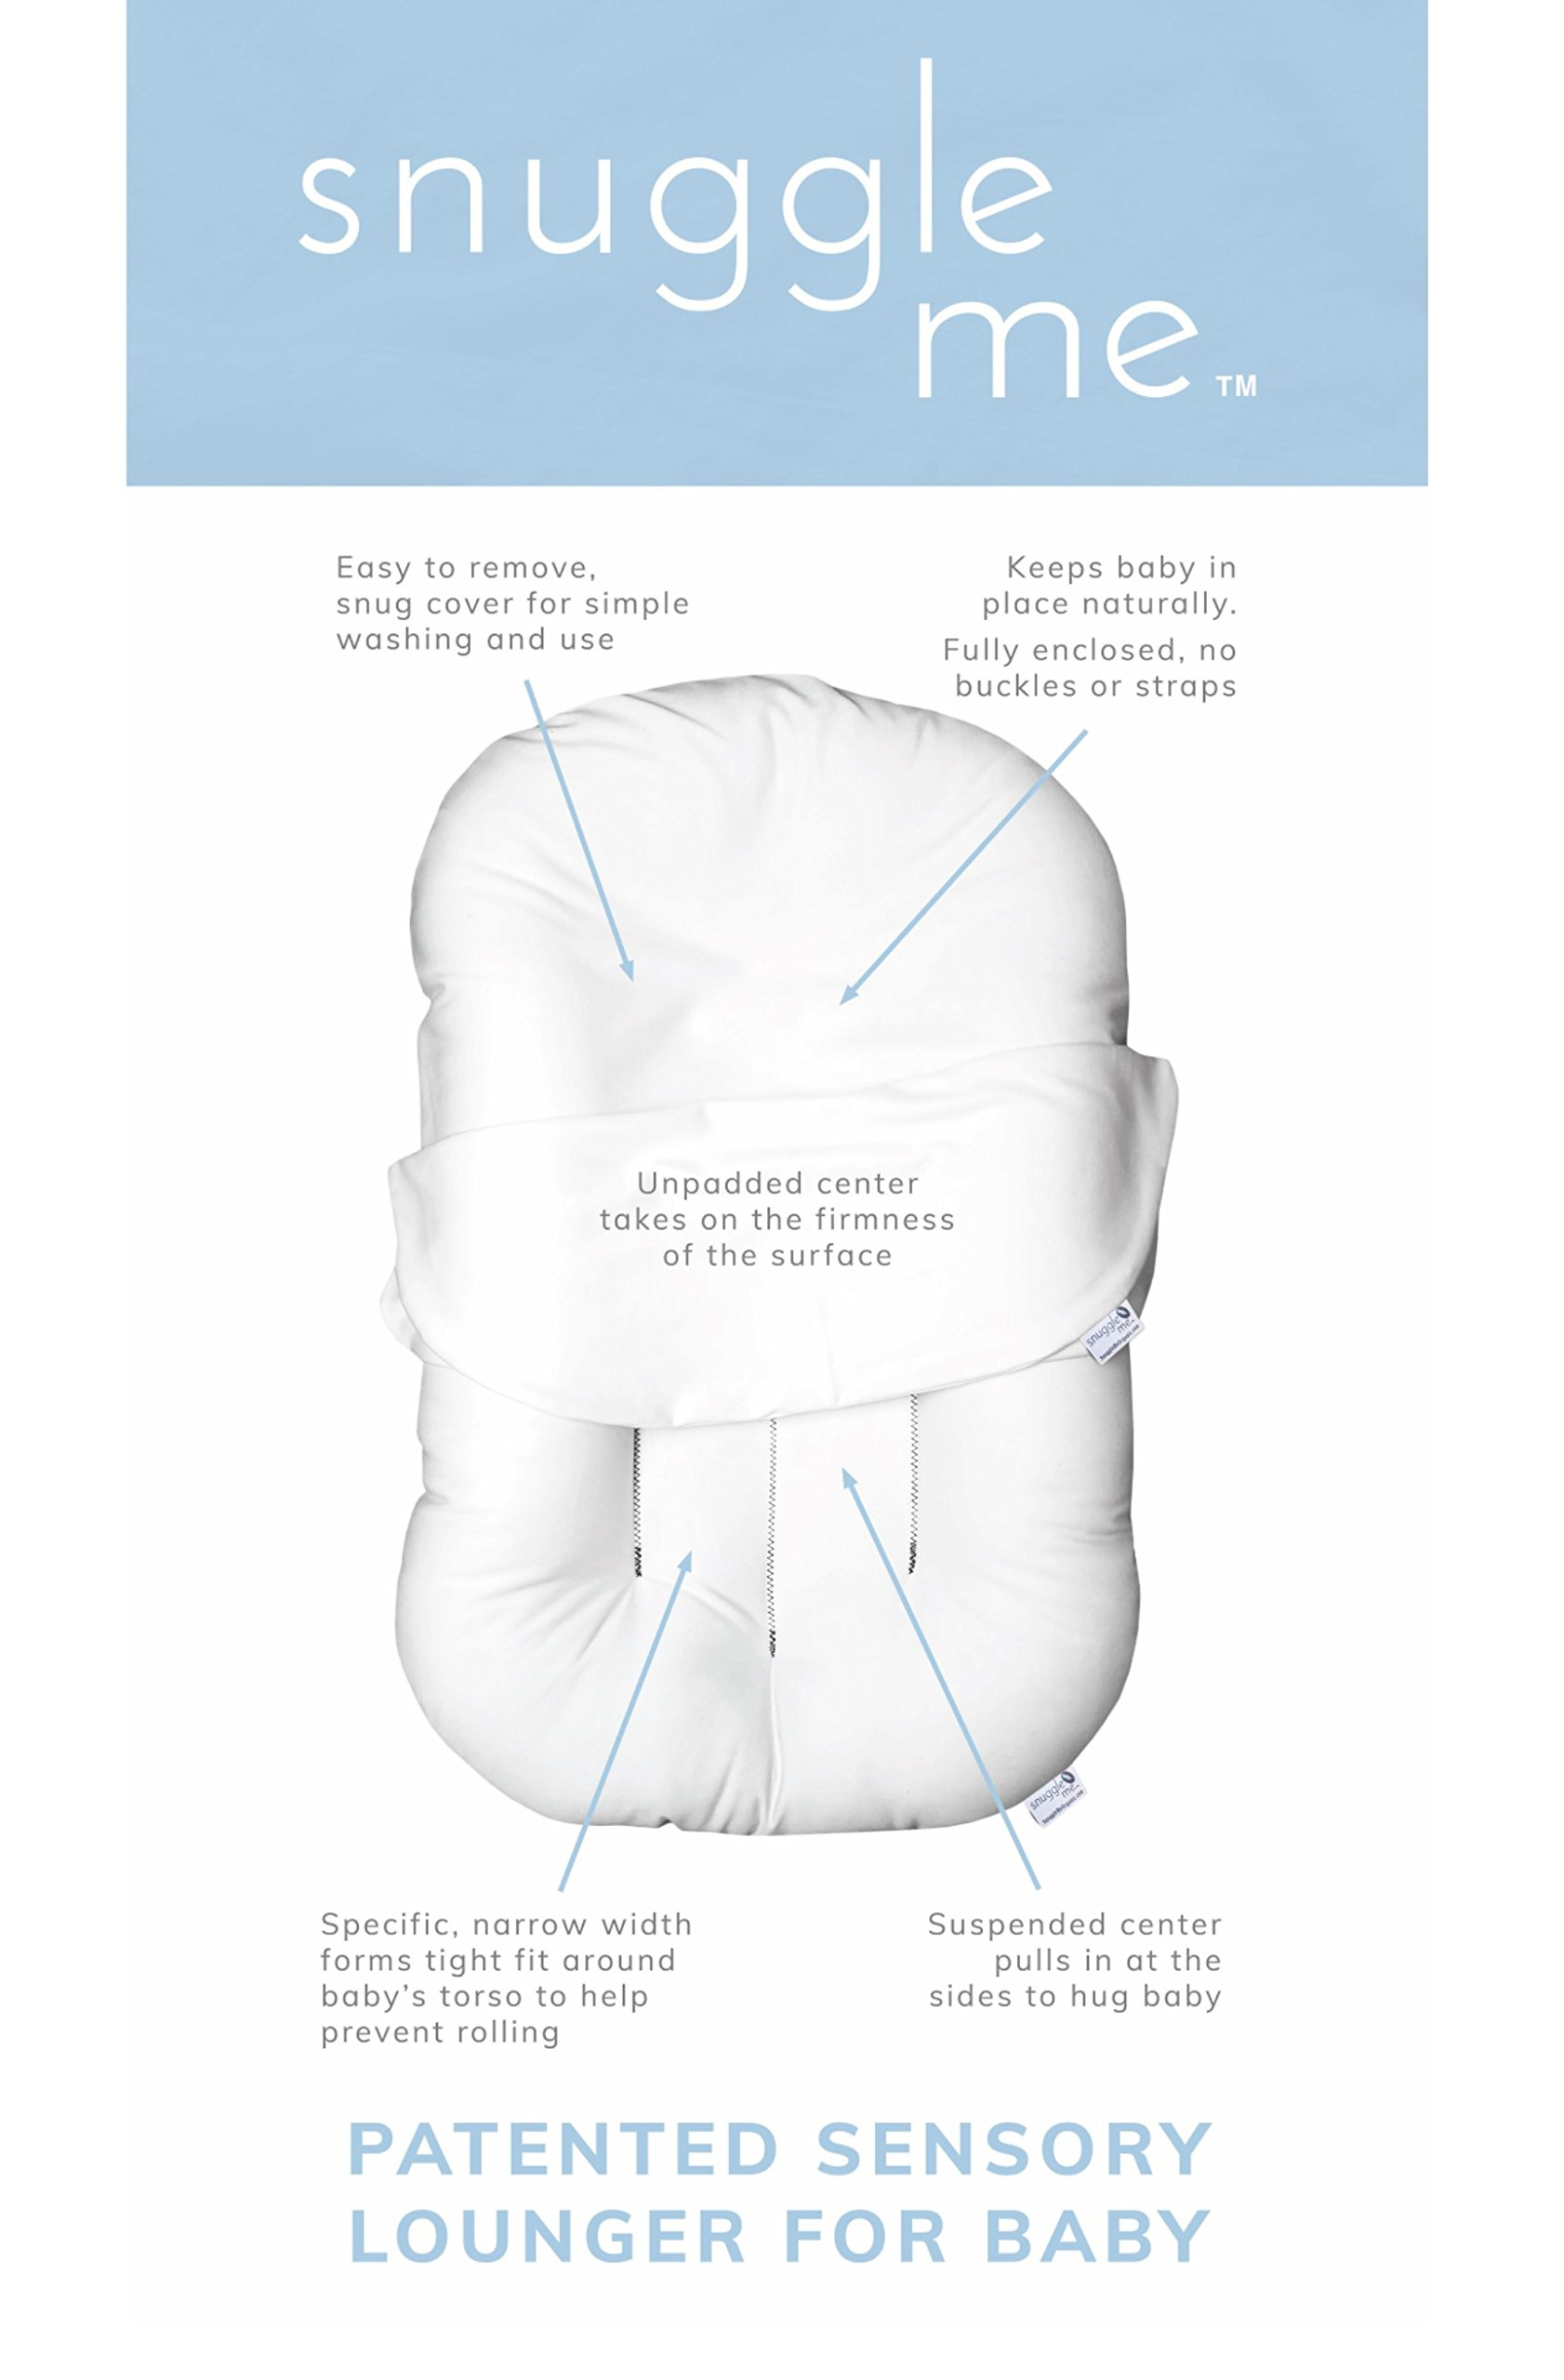 Snuggle Me Organic   Patented Sensory Lounger for Baby   organic cotton, virgin fiberfill